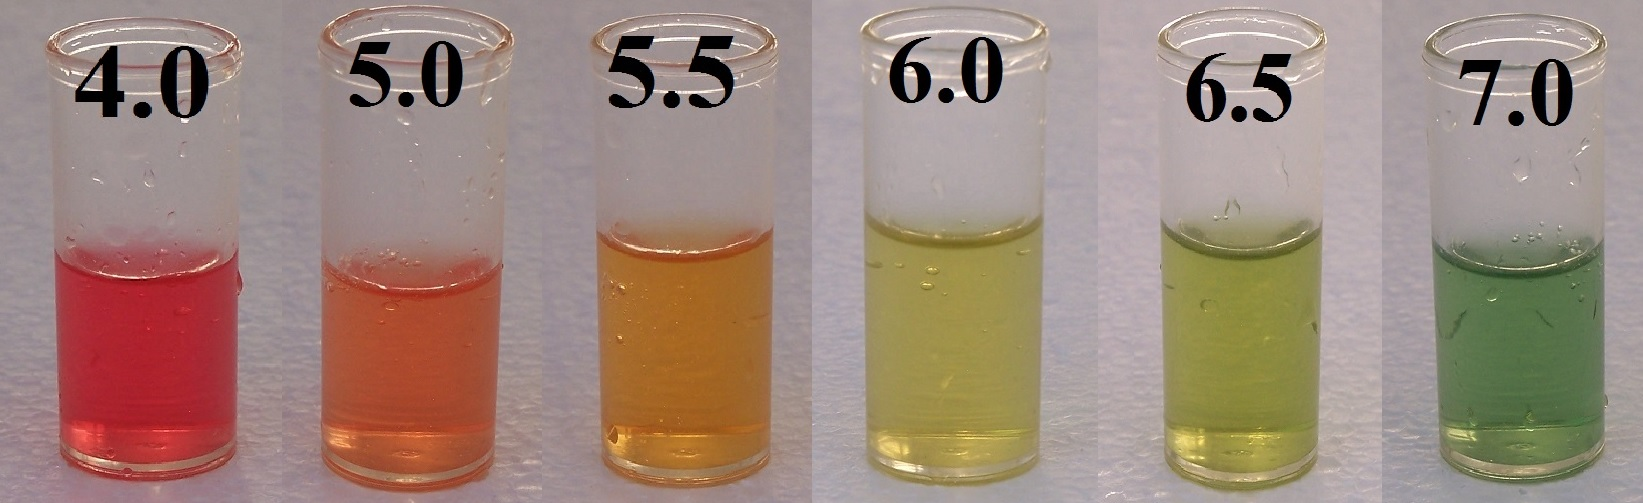 pH%20color%20scale.jpg